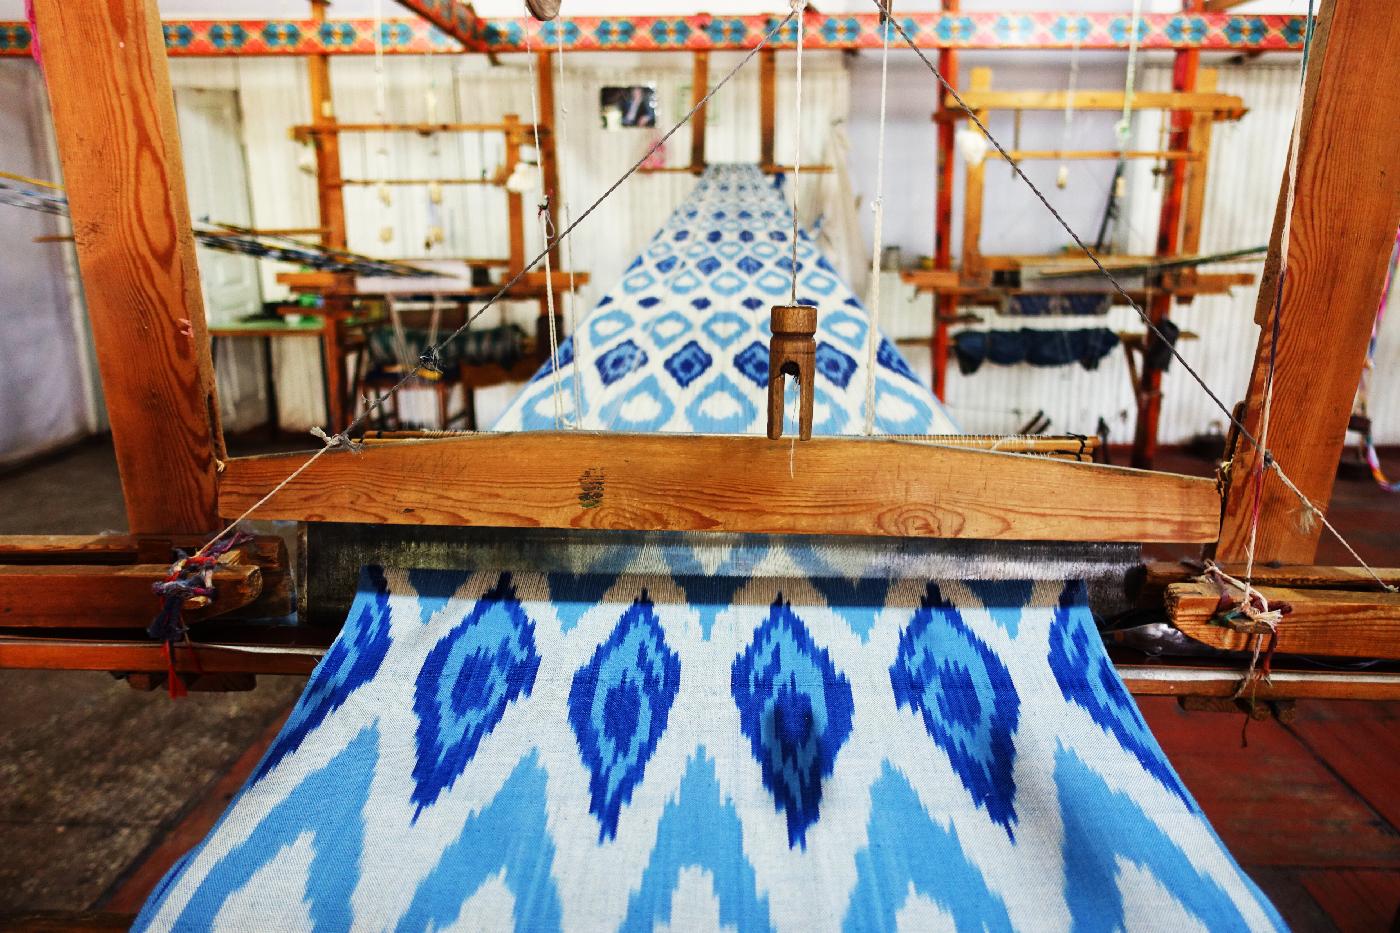 Ferghana Soie fabrique uzbekistan